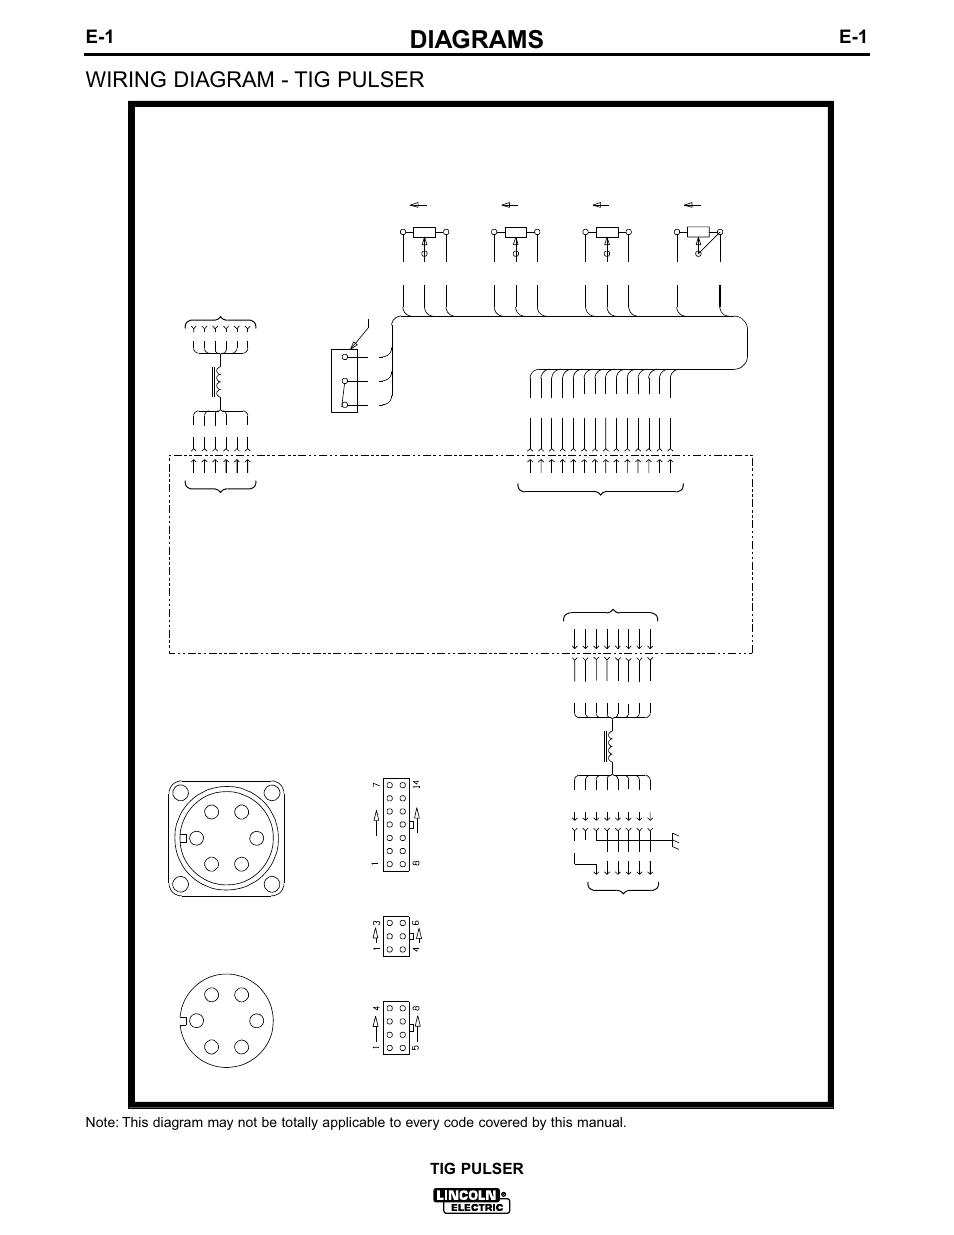 Reese Brakeman Compact Wiring Diagram from www.manualsdir.com